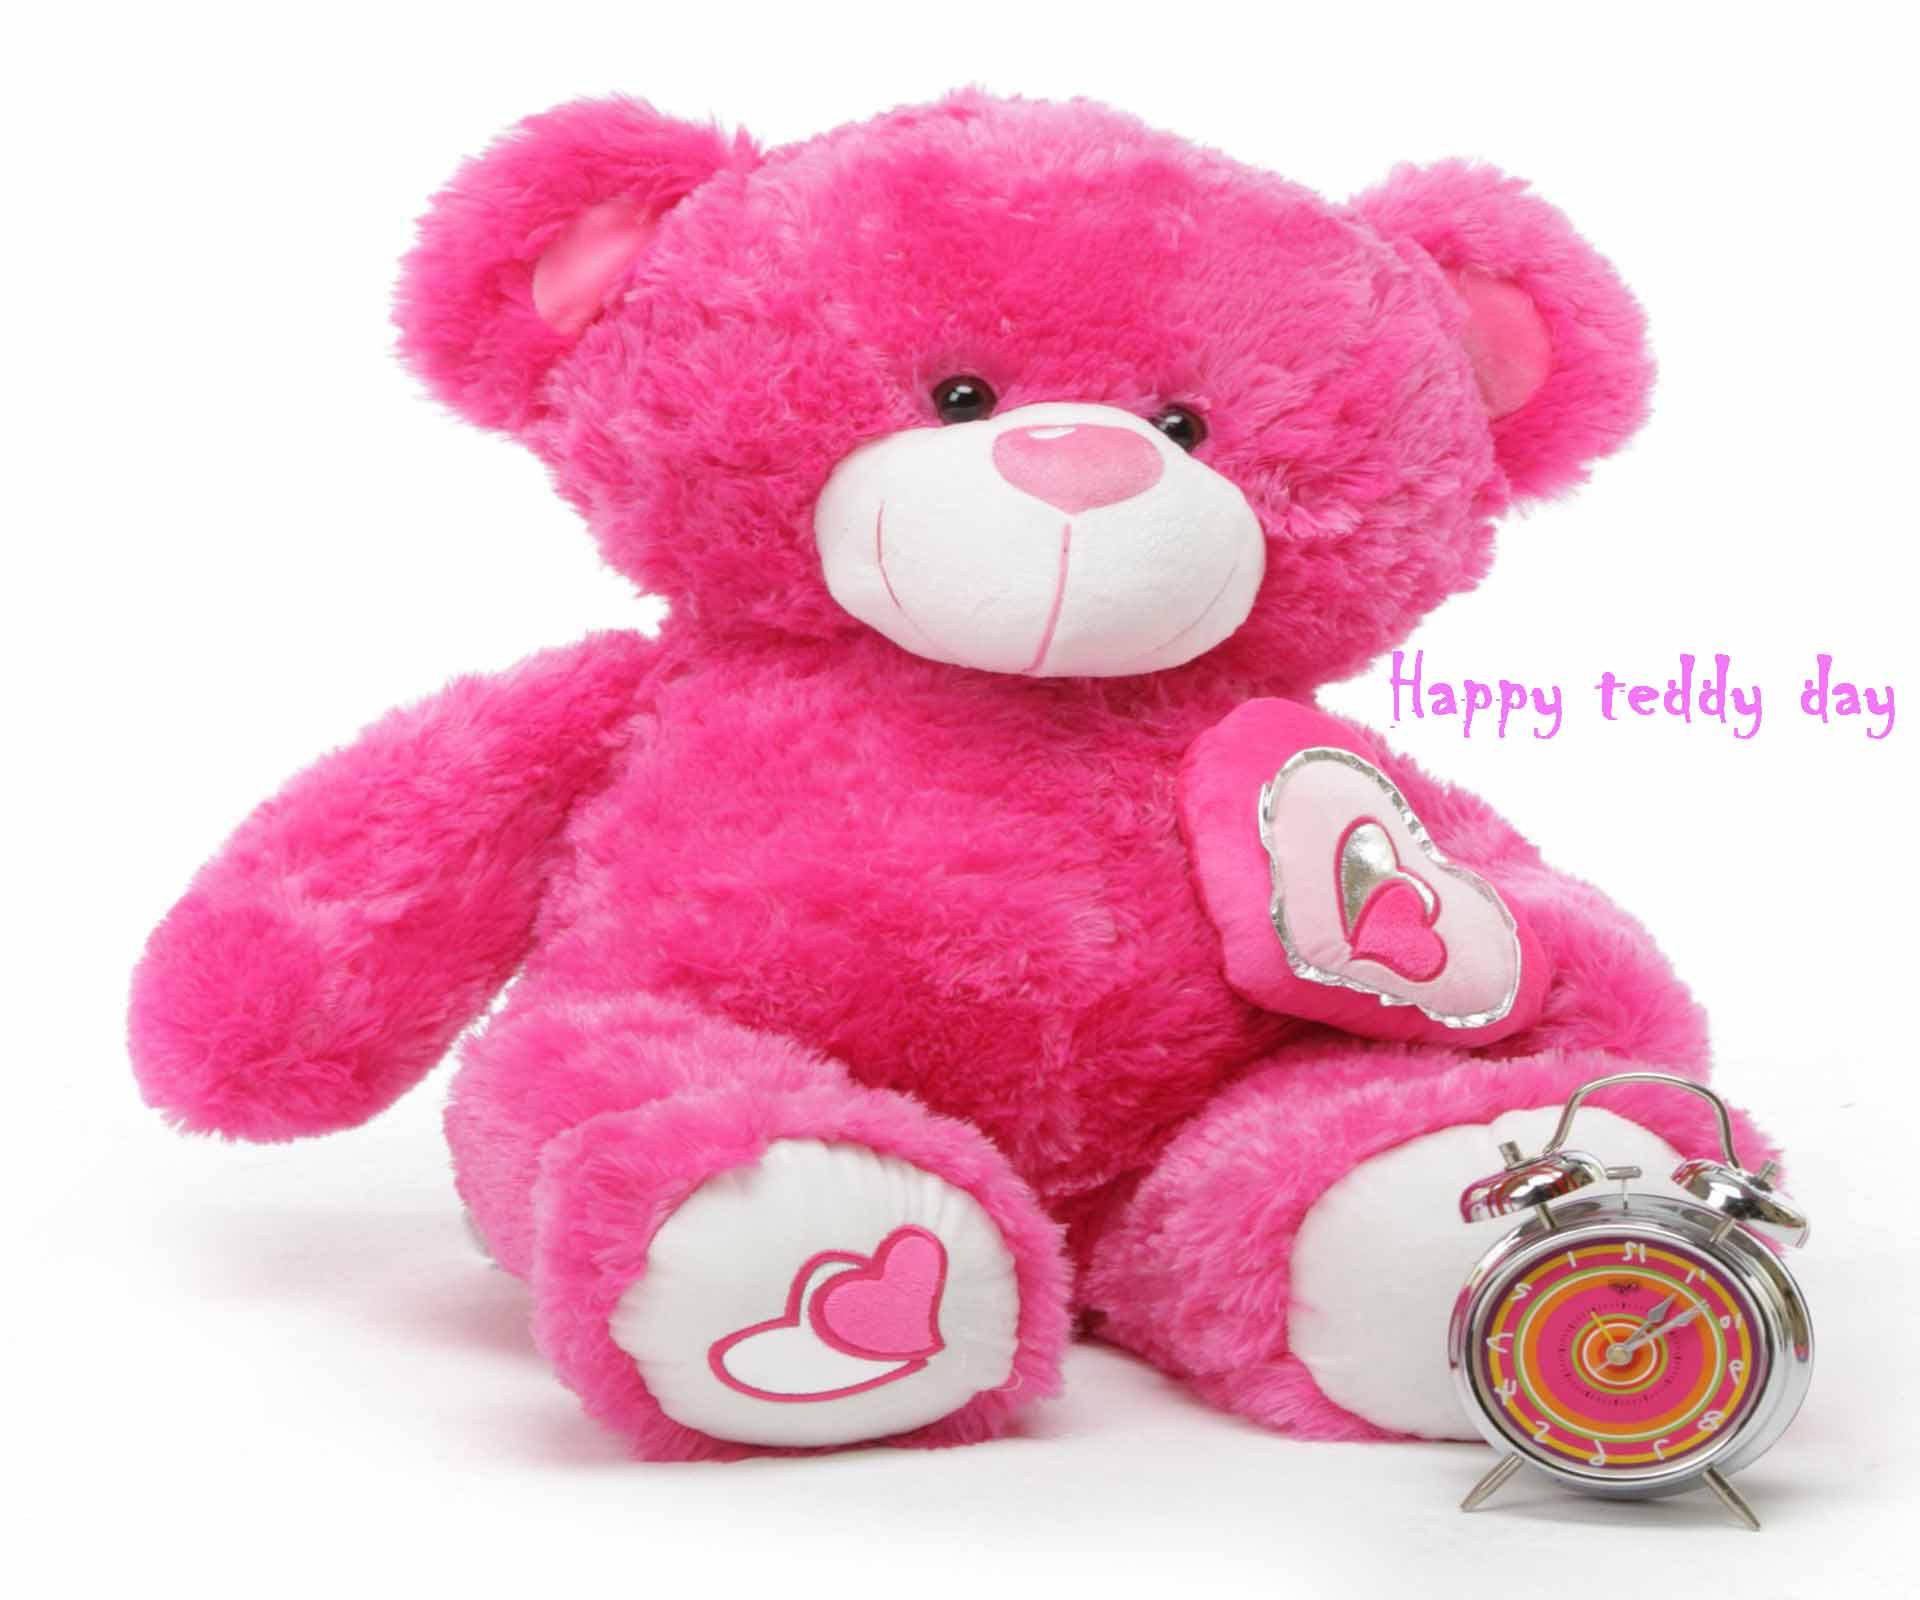 Teddy day wallpapers wallpaper cave pink color teddy happy teddy day hd wallpapers love wallpaper altavistaventures Images